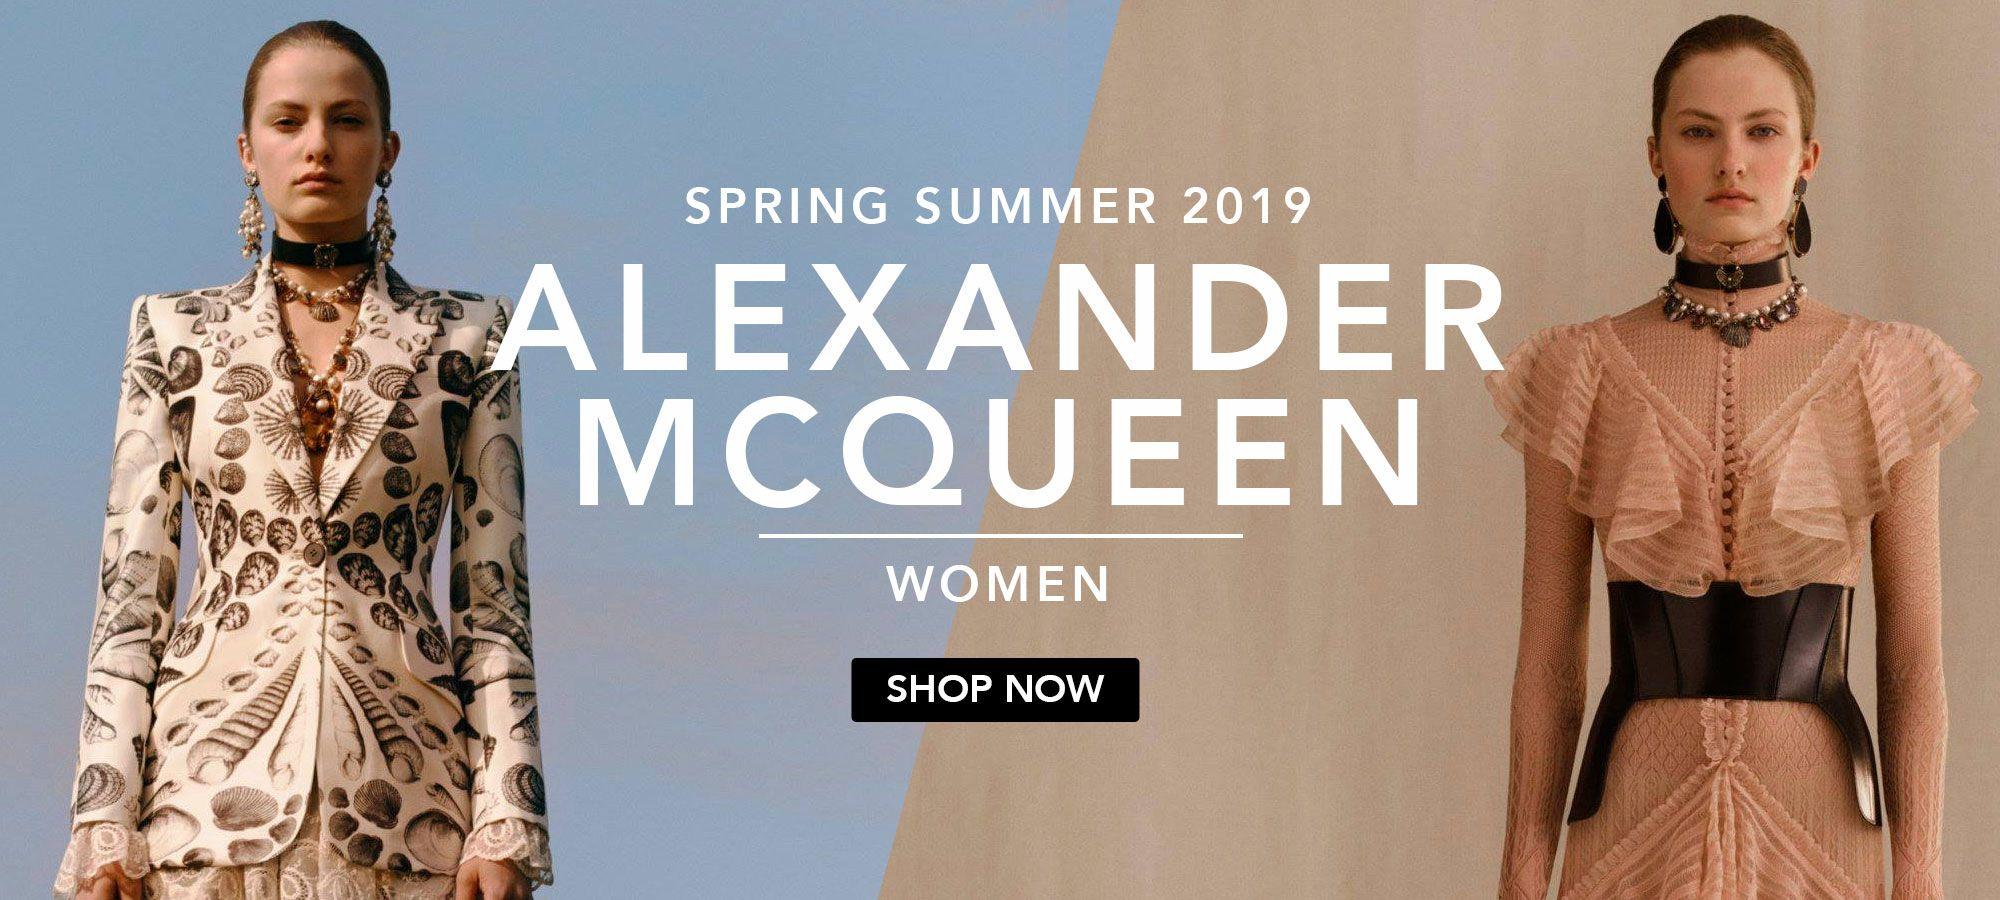 Alexander McQueen Women Spring Summer 2019 by italist